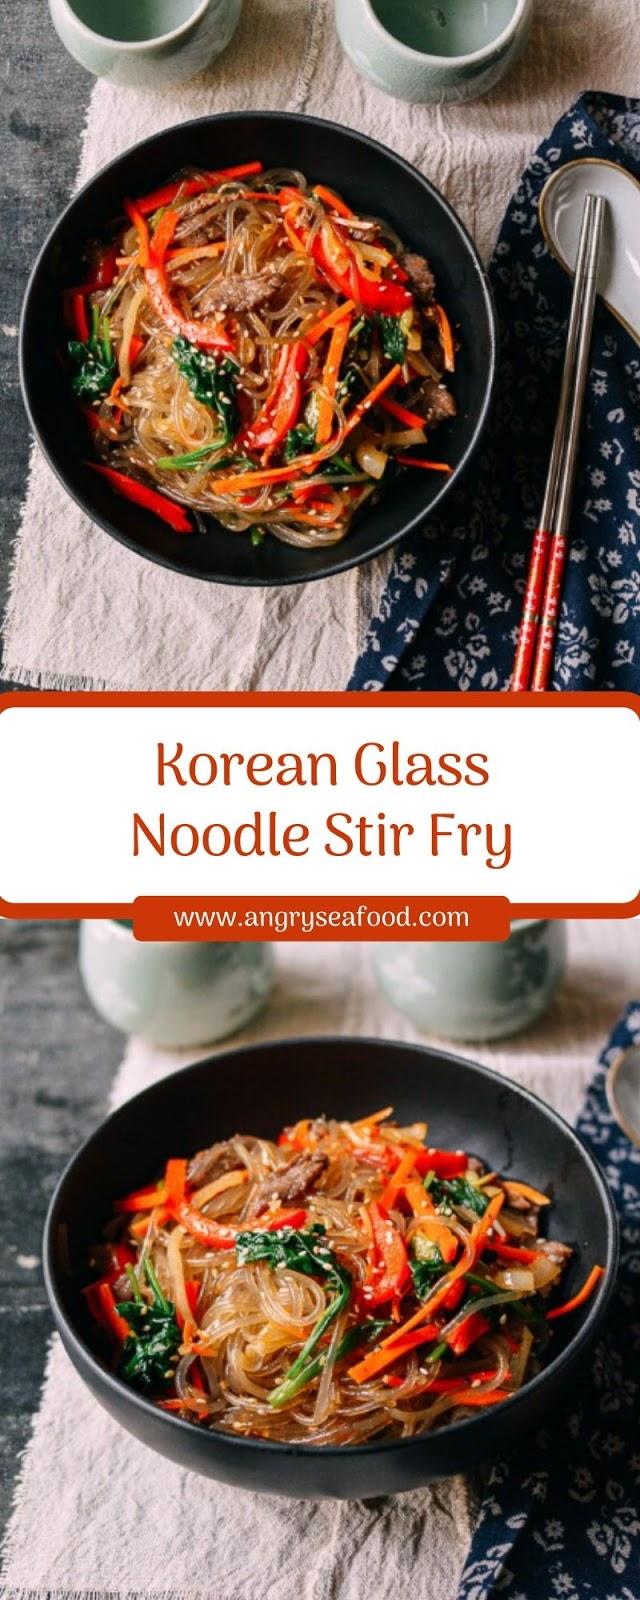 Korean Glass Noodle Stir Fry